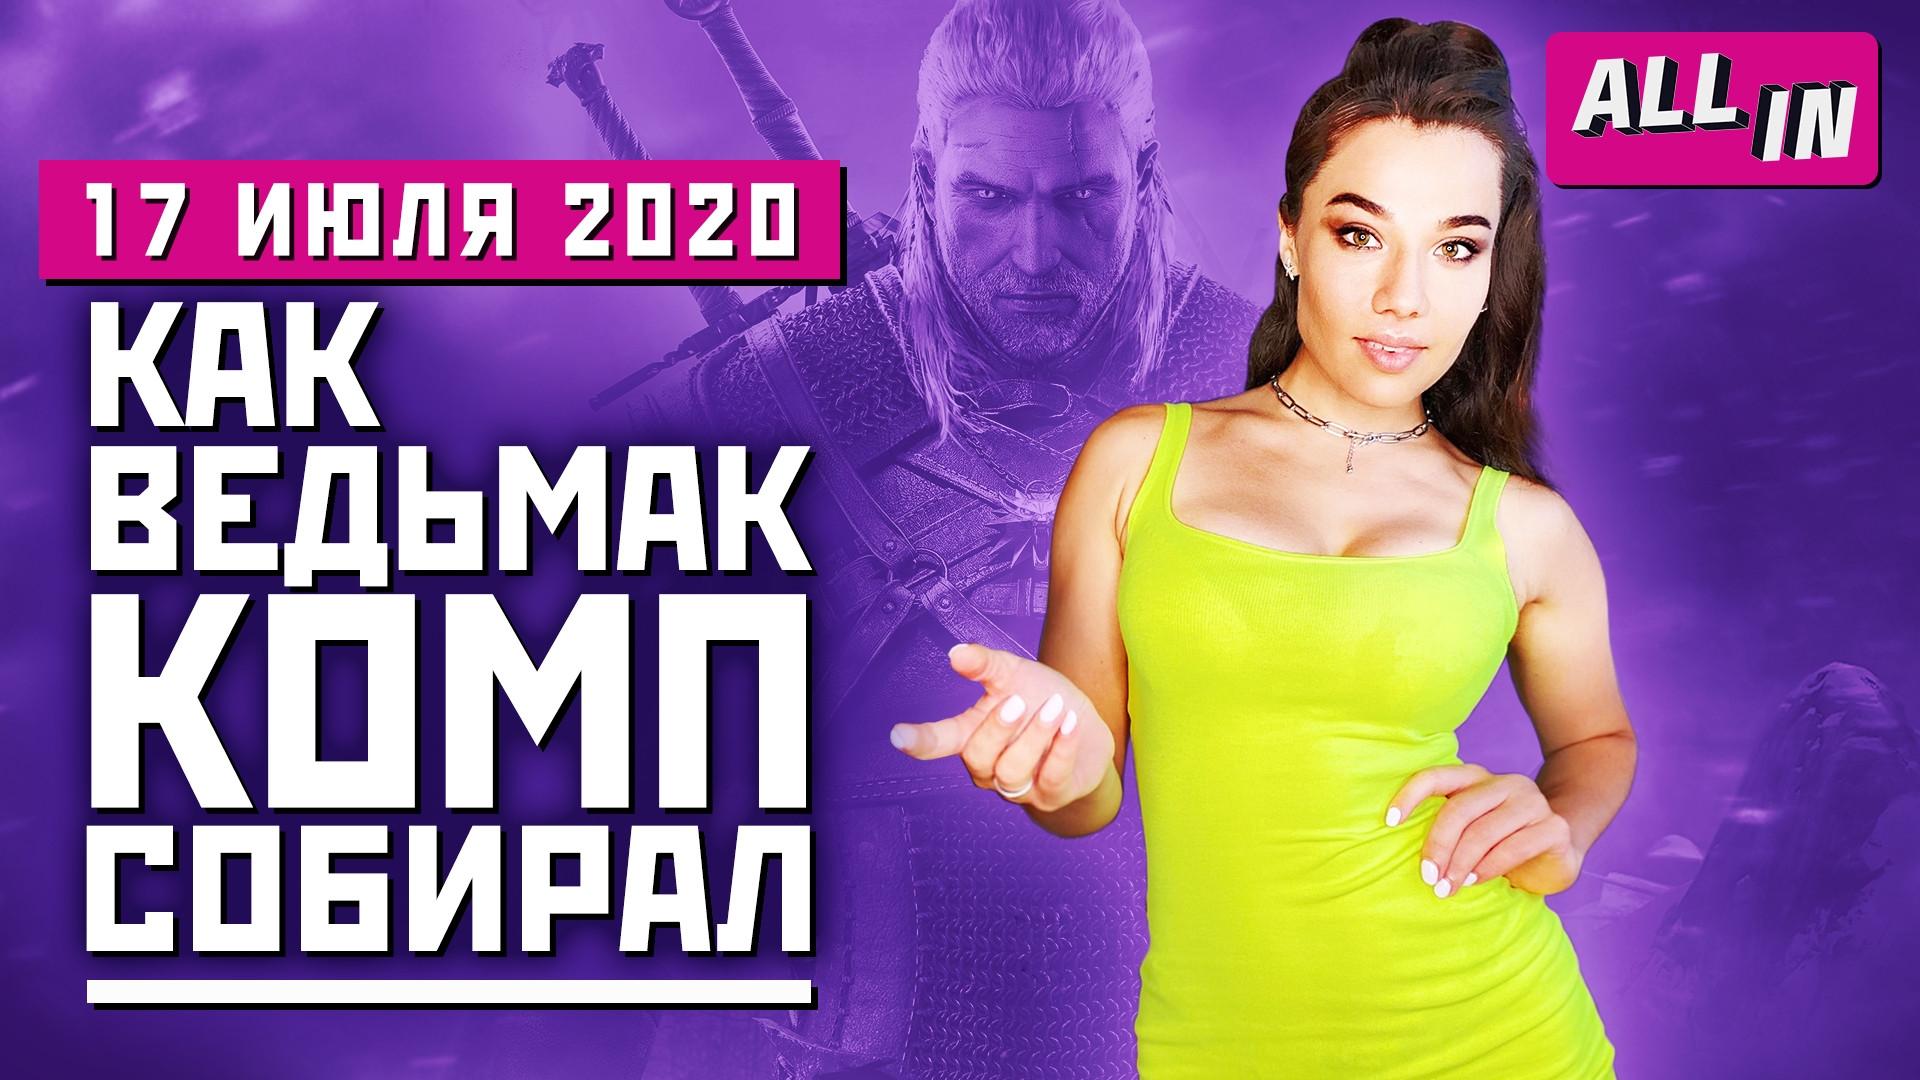 Dead Space в No Man's Sky, PC от Ведьмака, производство новых Xbox One. Игровые новости ALL IN17.07